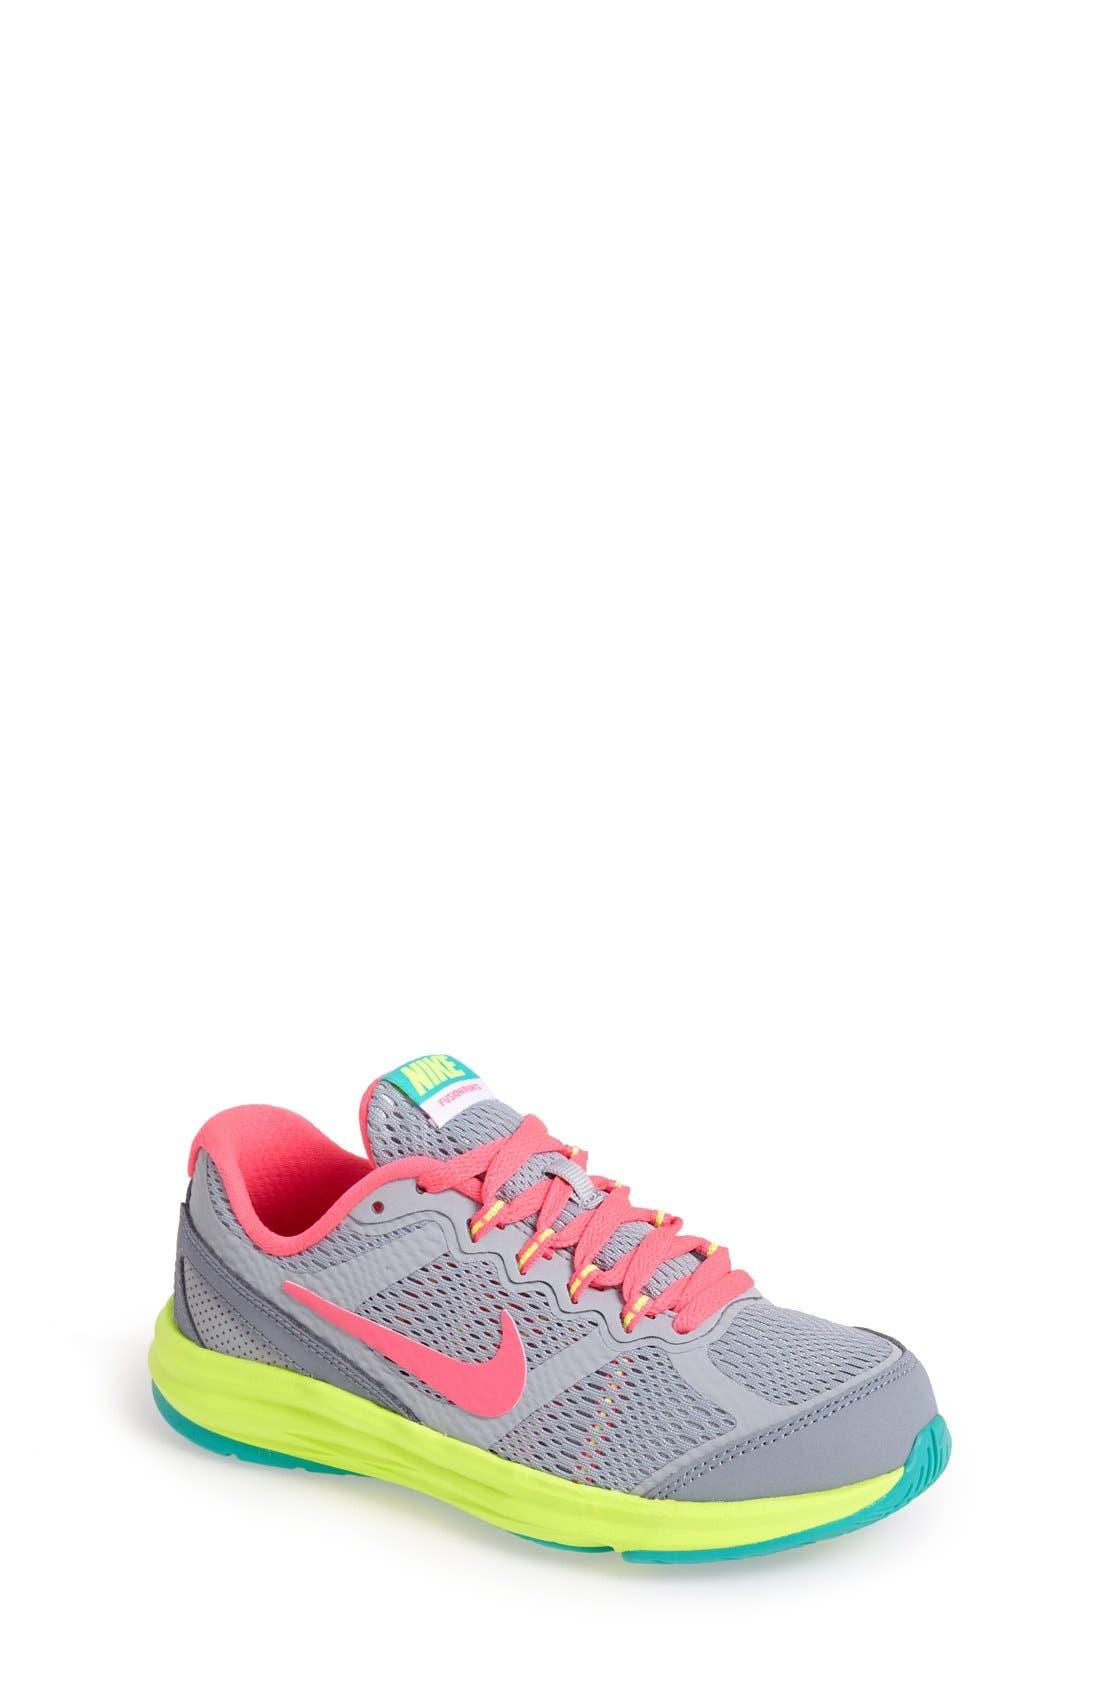 Alternate Image 1 Selected - Nike 'Dual Fusion Run' Athletic Shoe (Toddler & Little Kid)